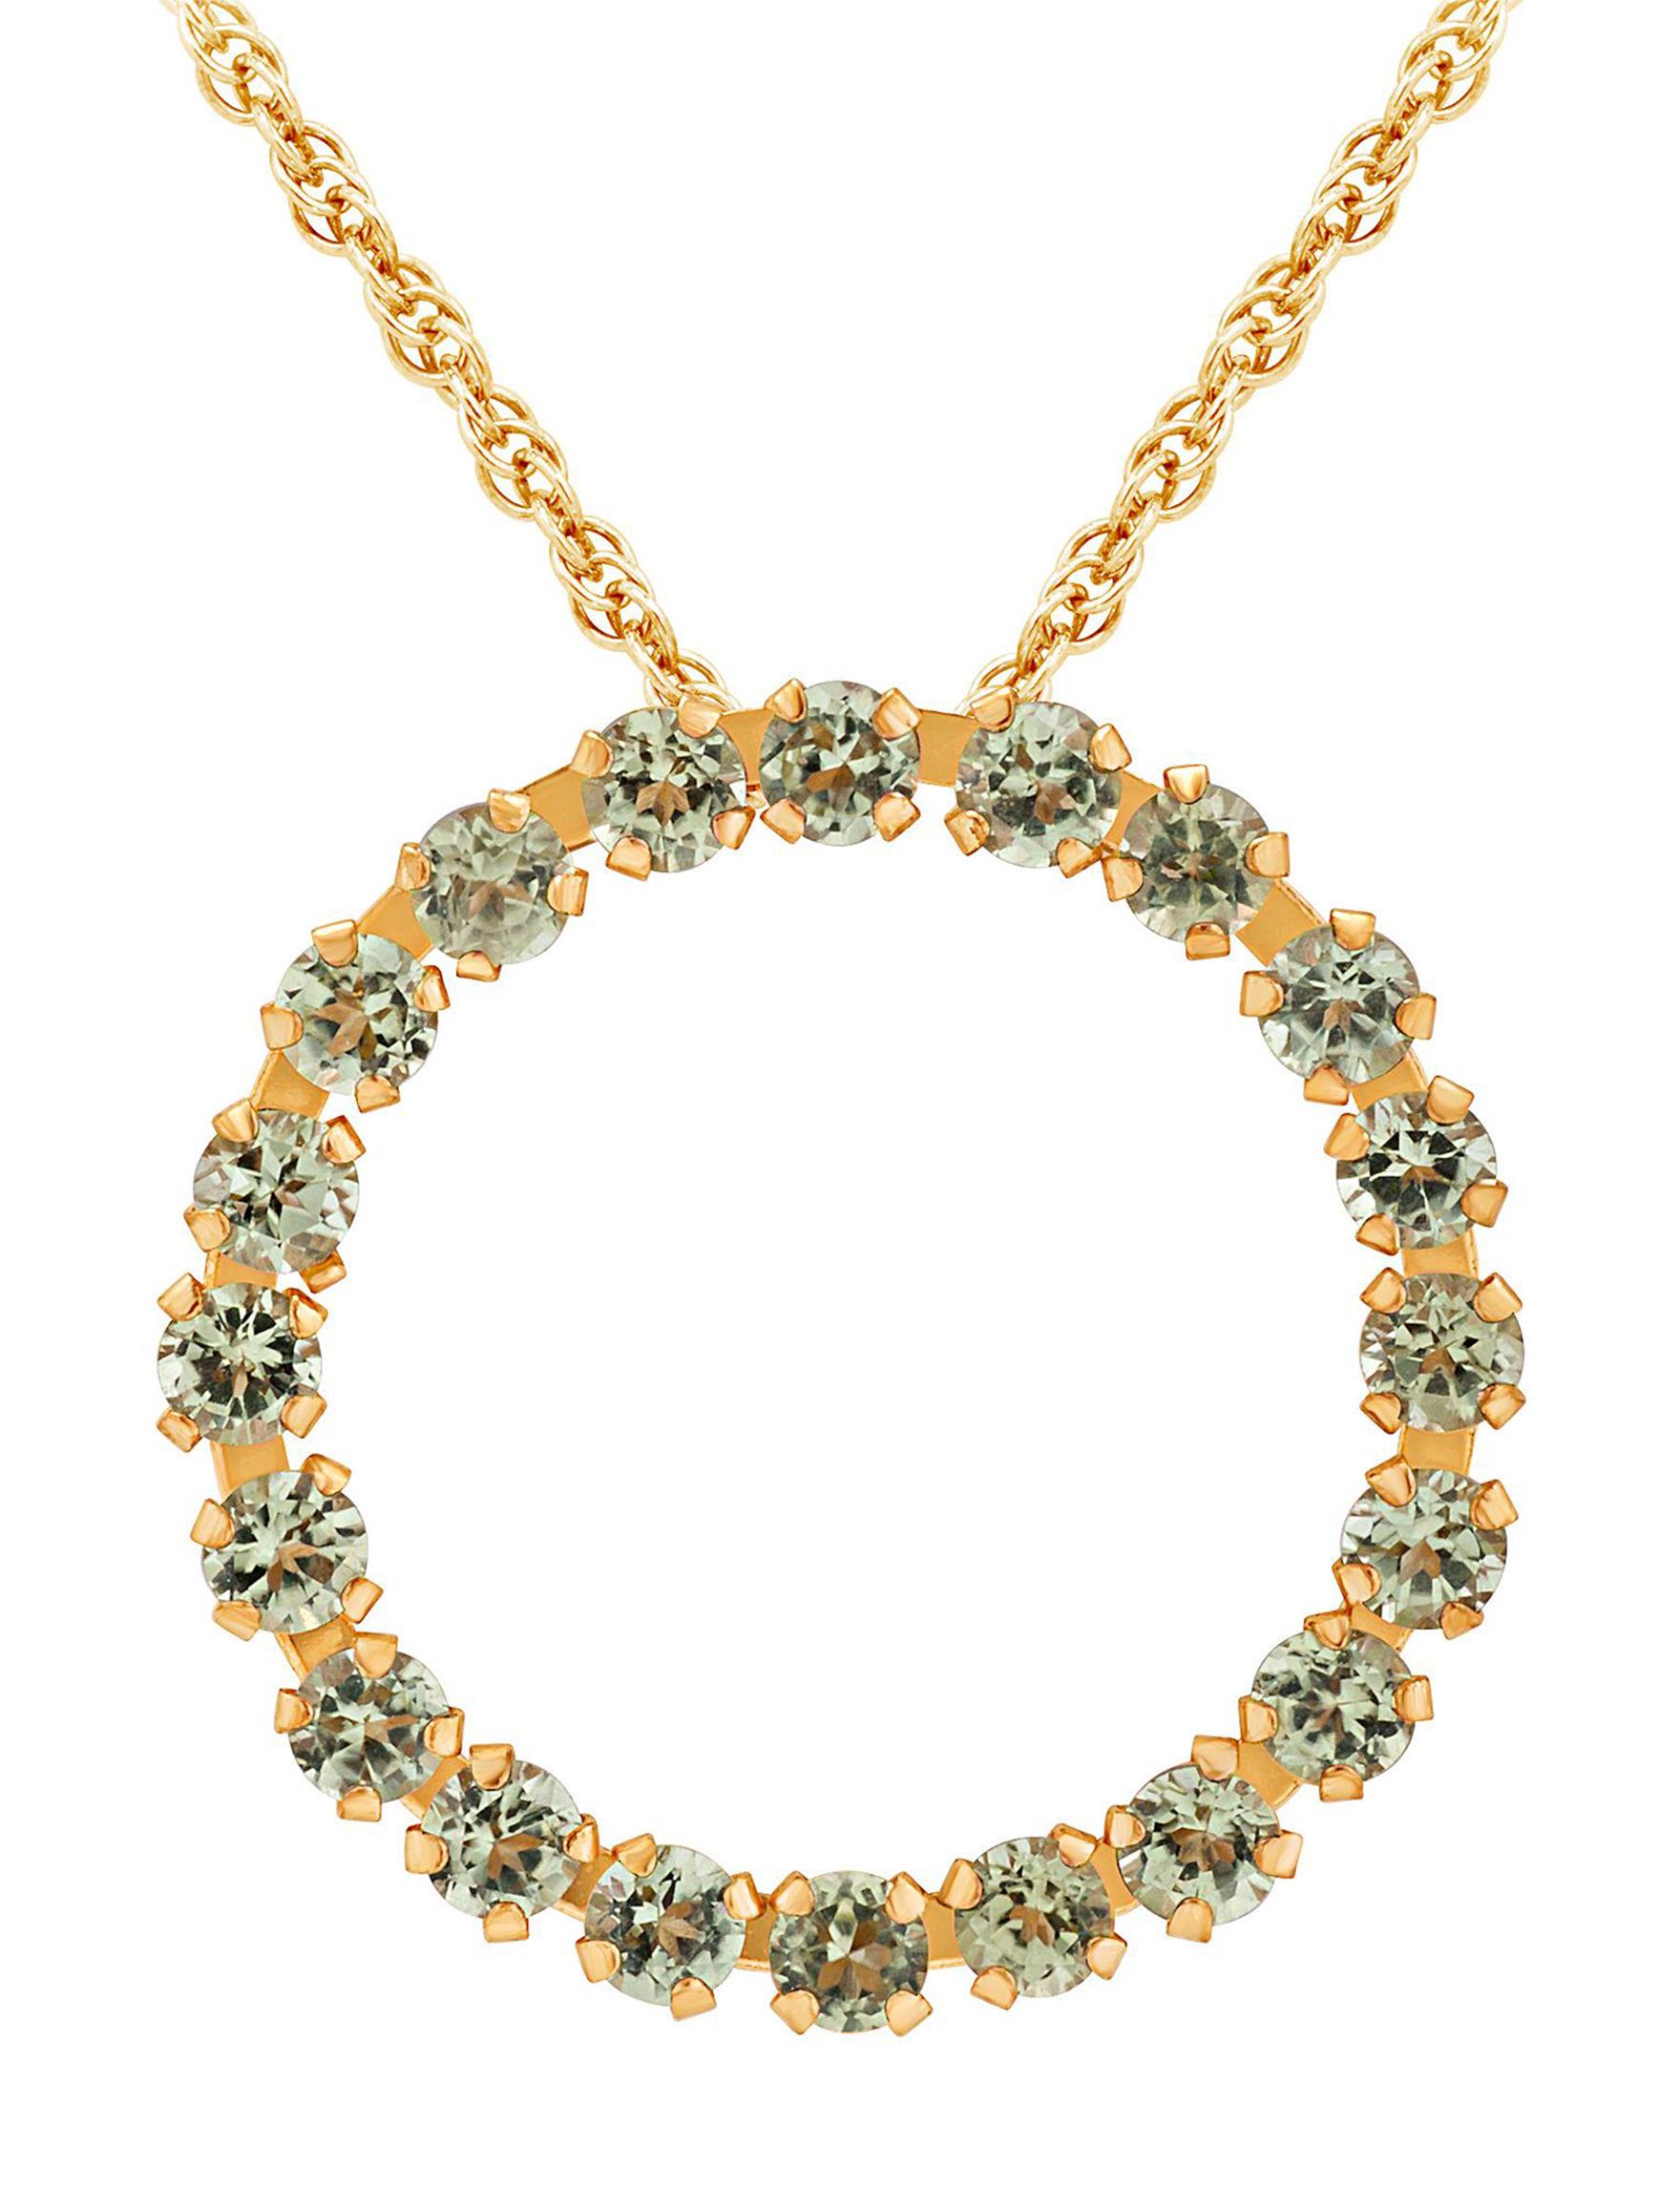 Kiran Gold Necklaces & Pendants Fine Jewelry